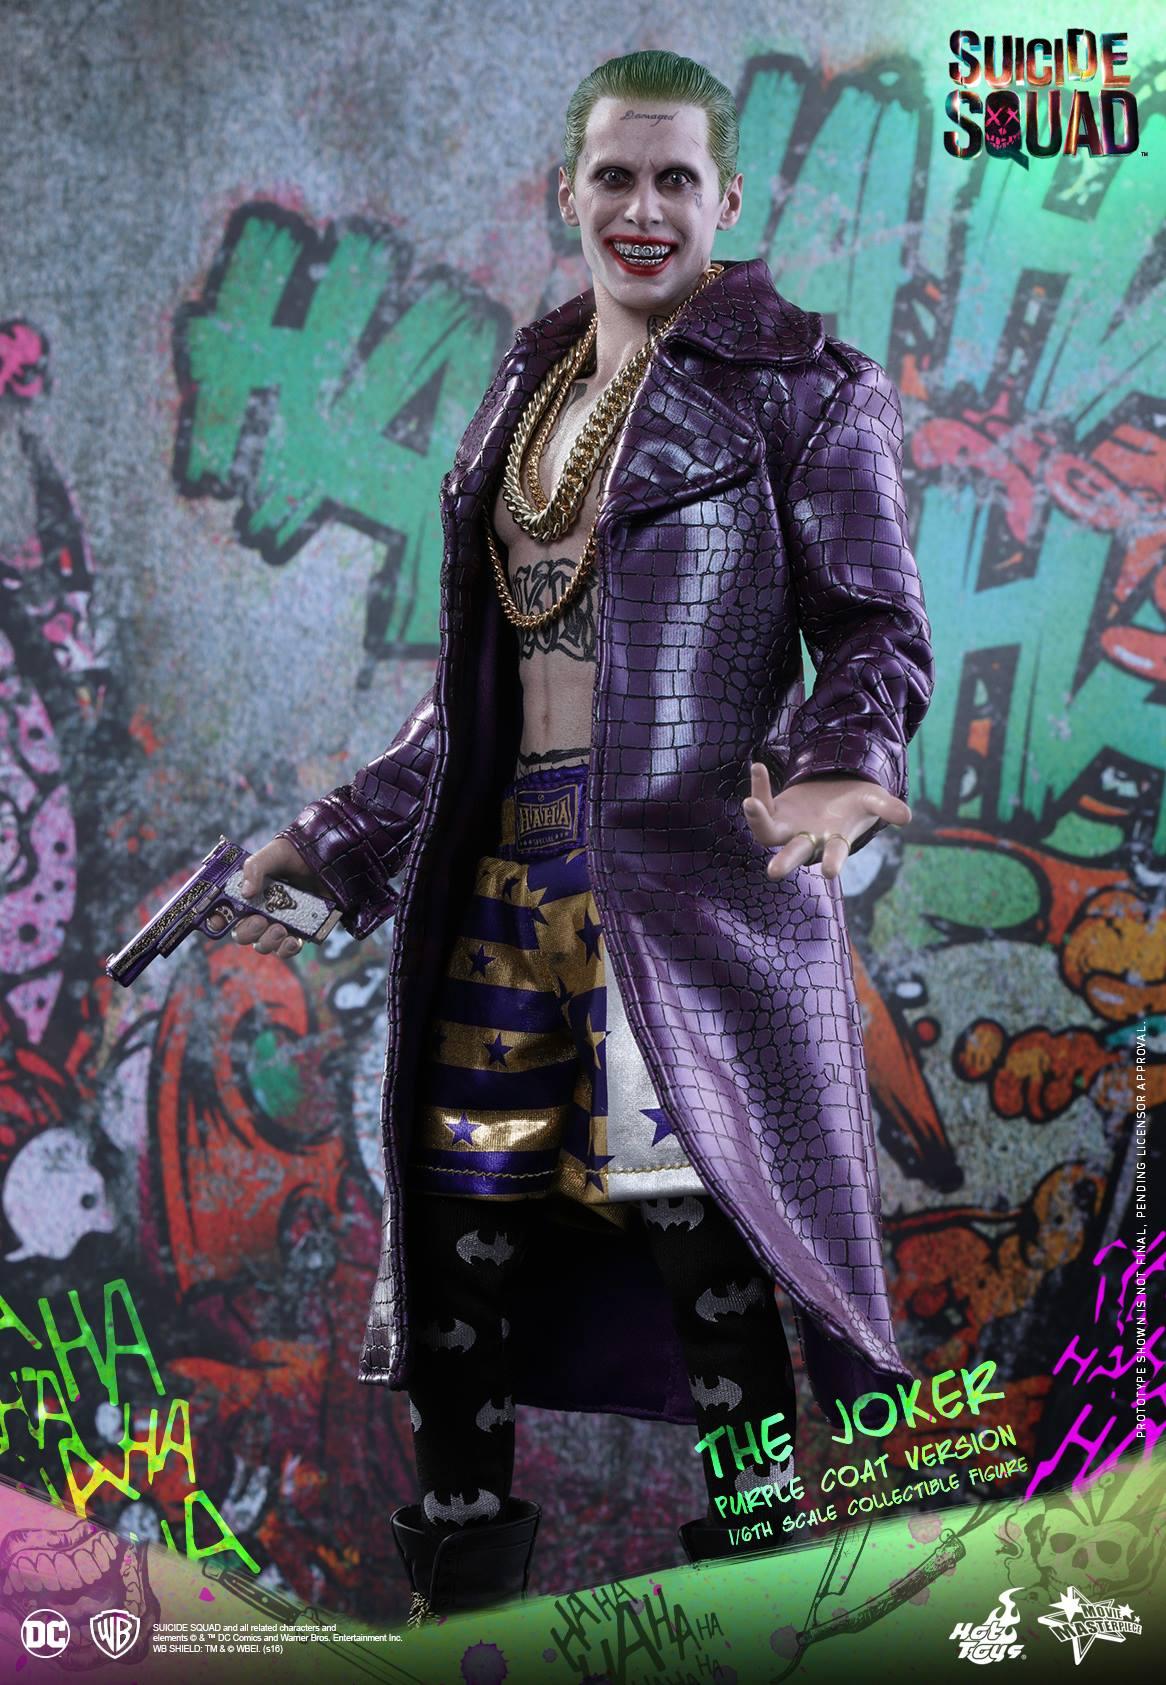 Hot-Toys-Suicide-Squad-Joker-Purple-Coat-17